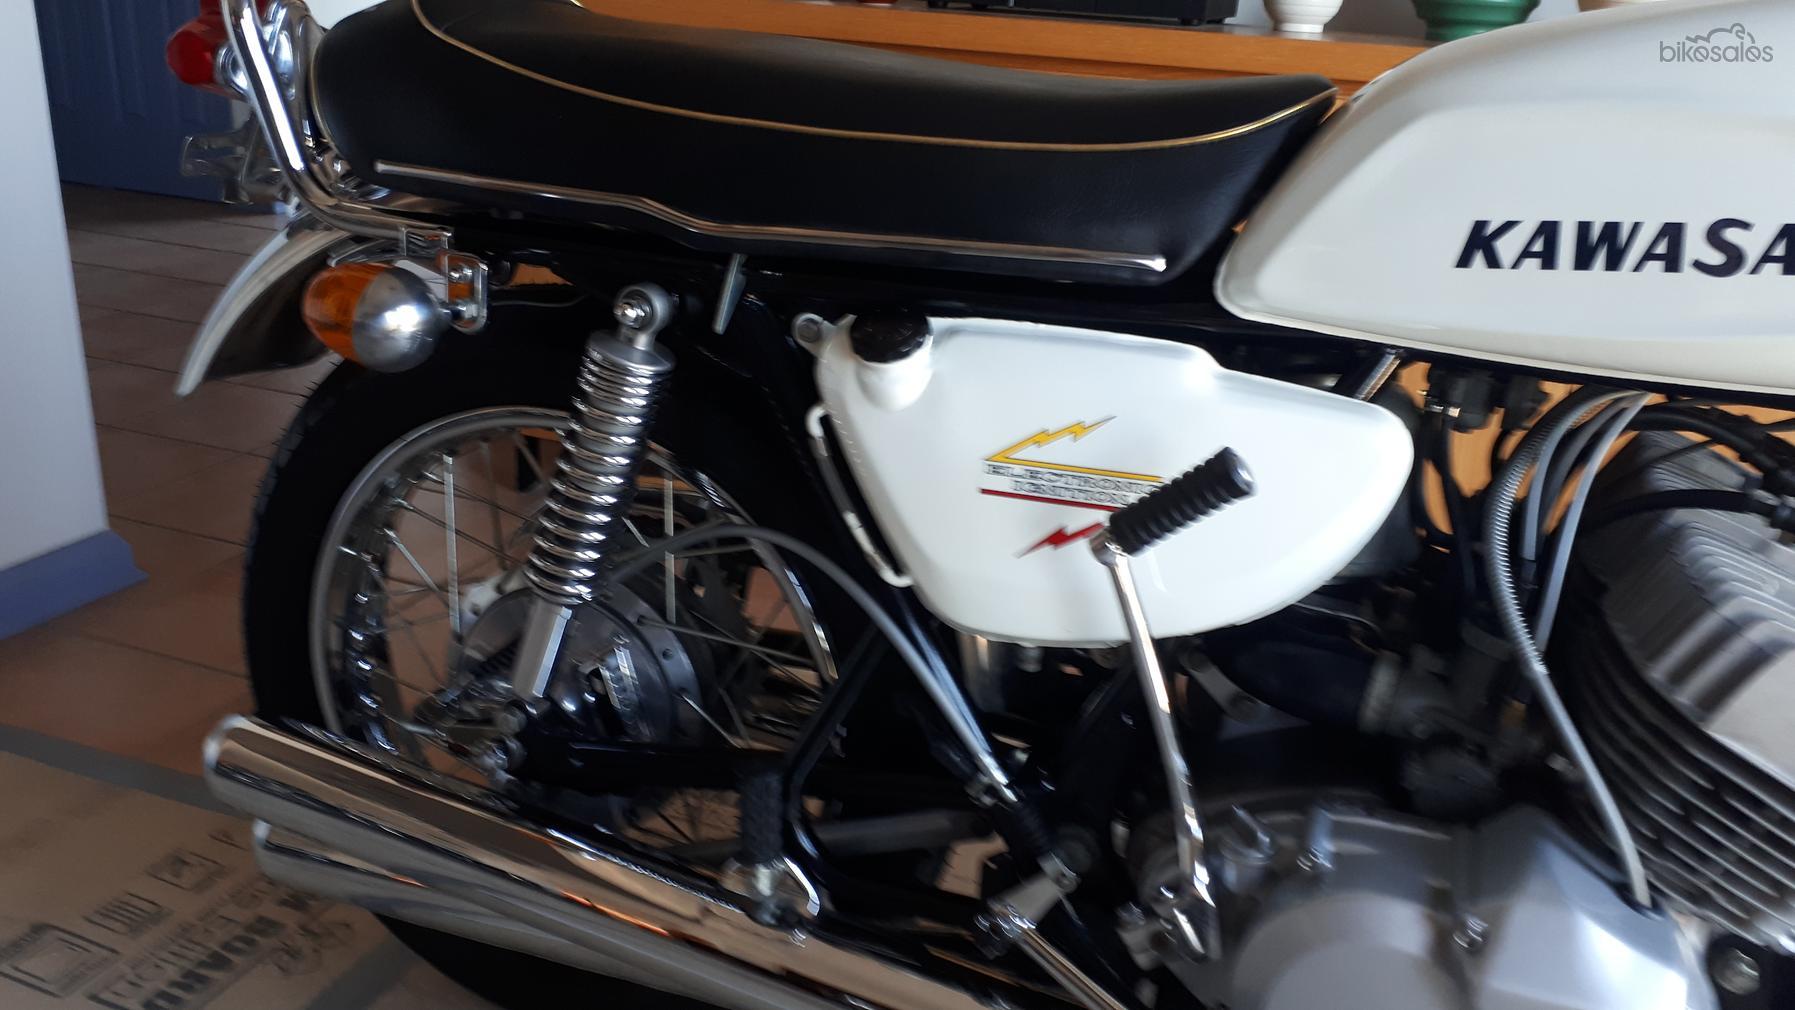 1969 Kawasaki H1-SSE-AD-5970888 - bikesales com au